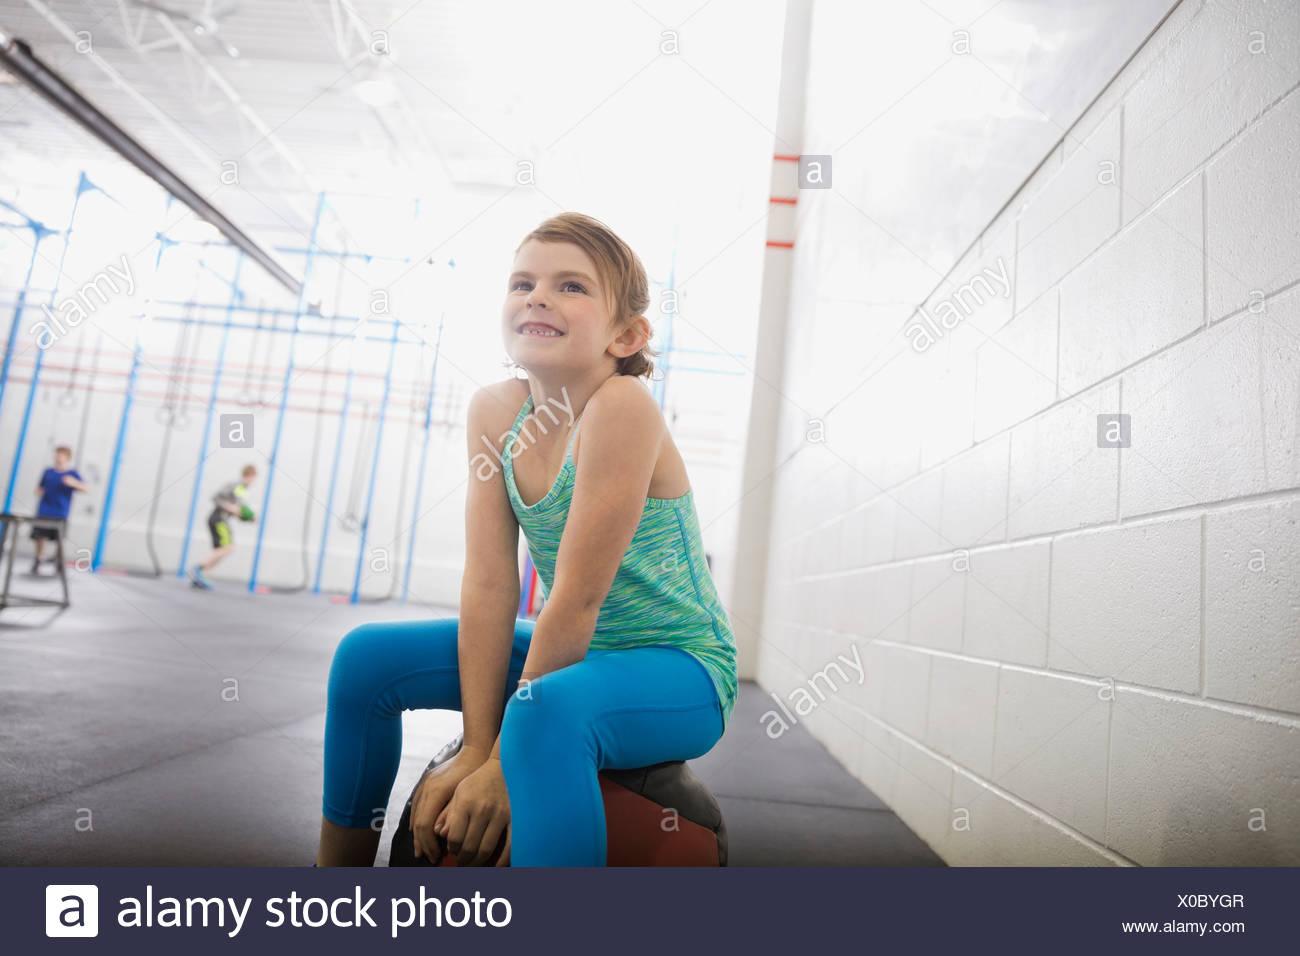 Girl sitting on medicine ball - Stock Image